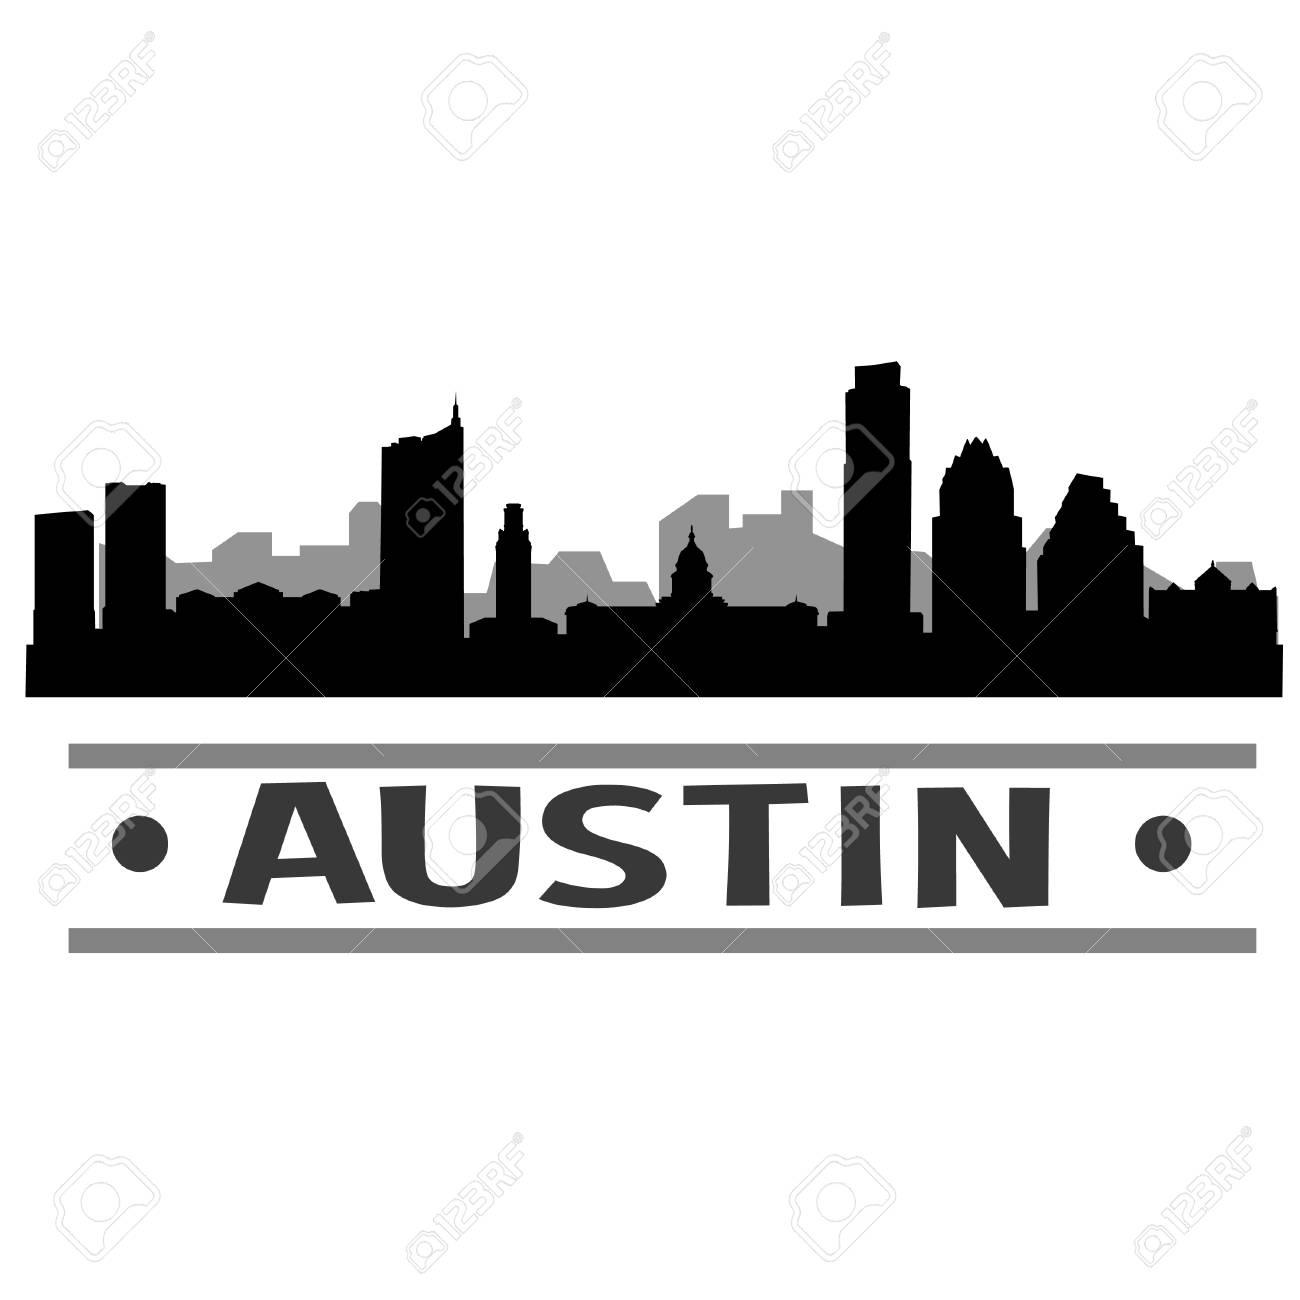 images?q=tbn:ANd9GcQh_l3eQ5xwiPy07kGEXjmjgmBKBRB7H2mRxCGhv1tFWg5c_mWT Ideas For City Skyline Vector Art Free @koolgadgetz.com.info